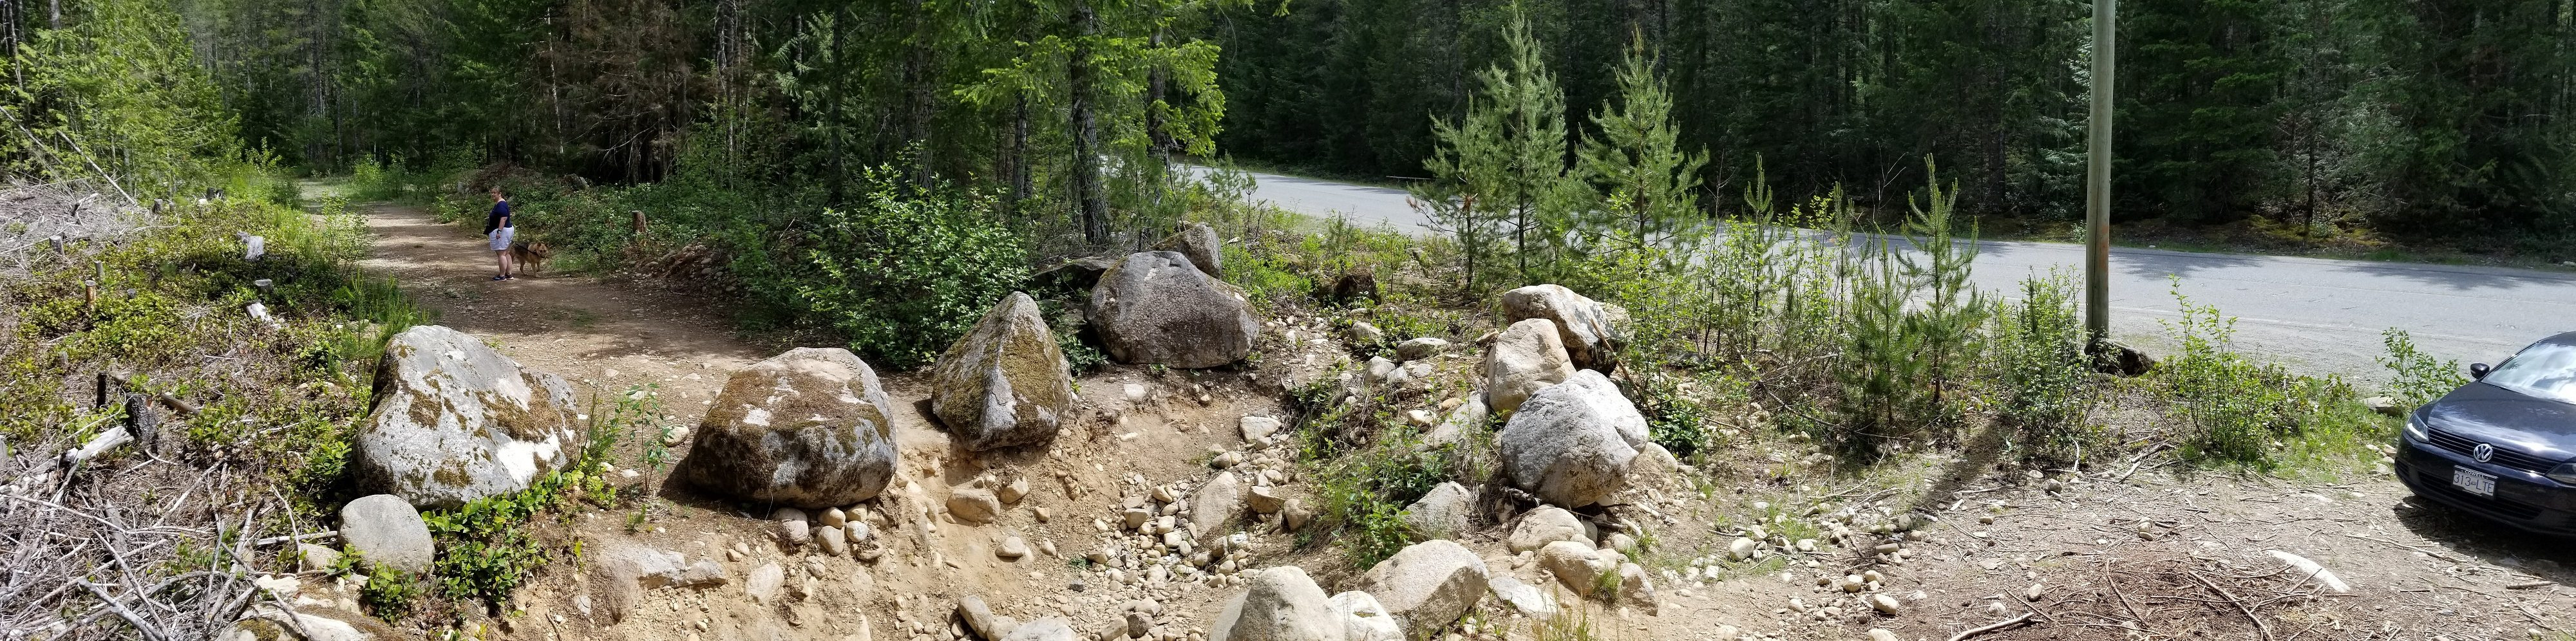 Bosumarne Falls Off-Leash Hike - Fraser Valley - BC (5)